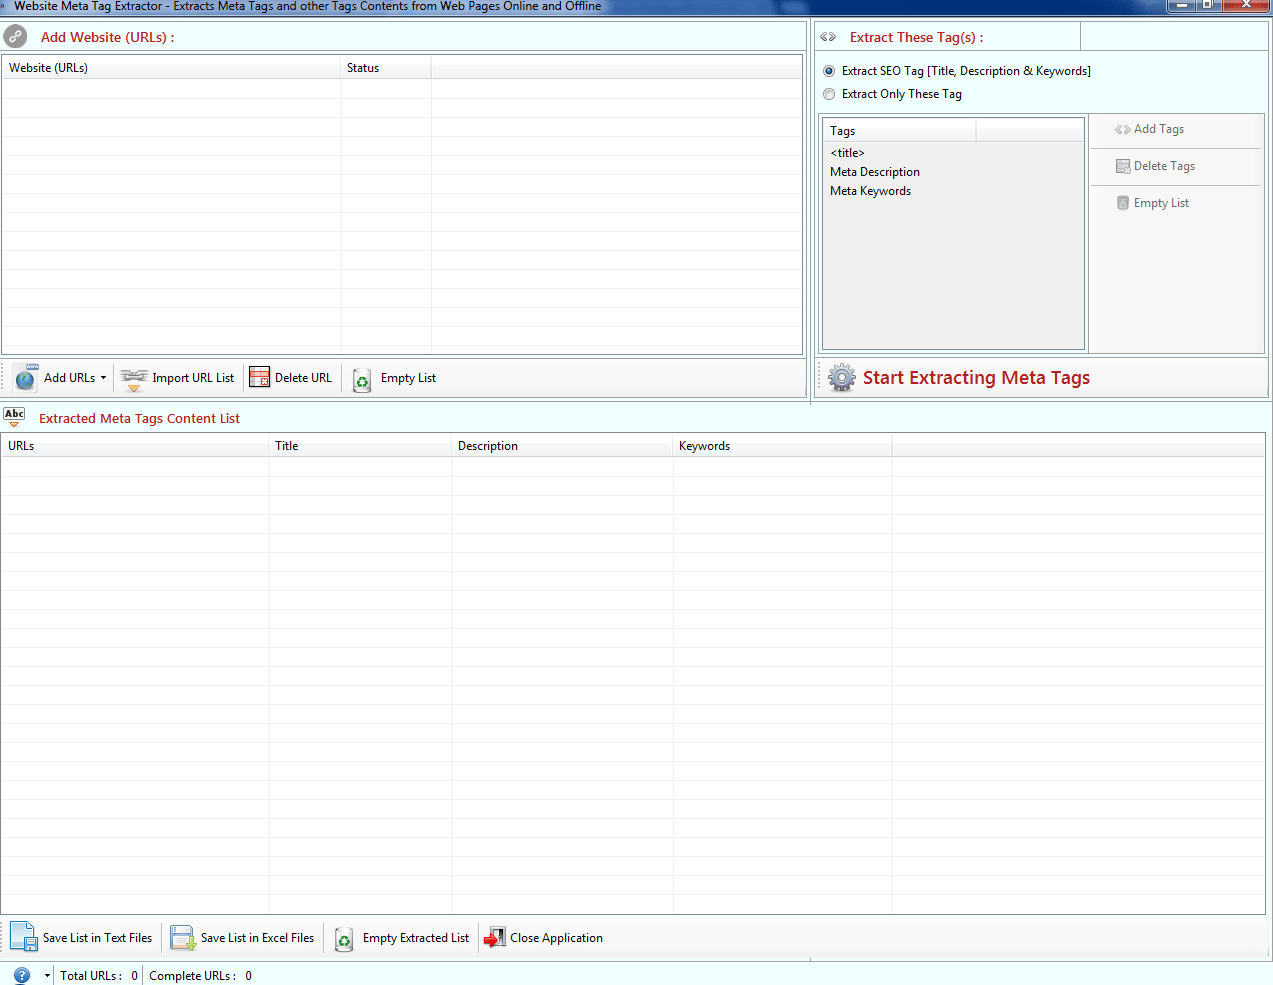 Website Meta Tag Extractor